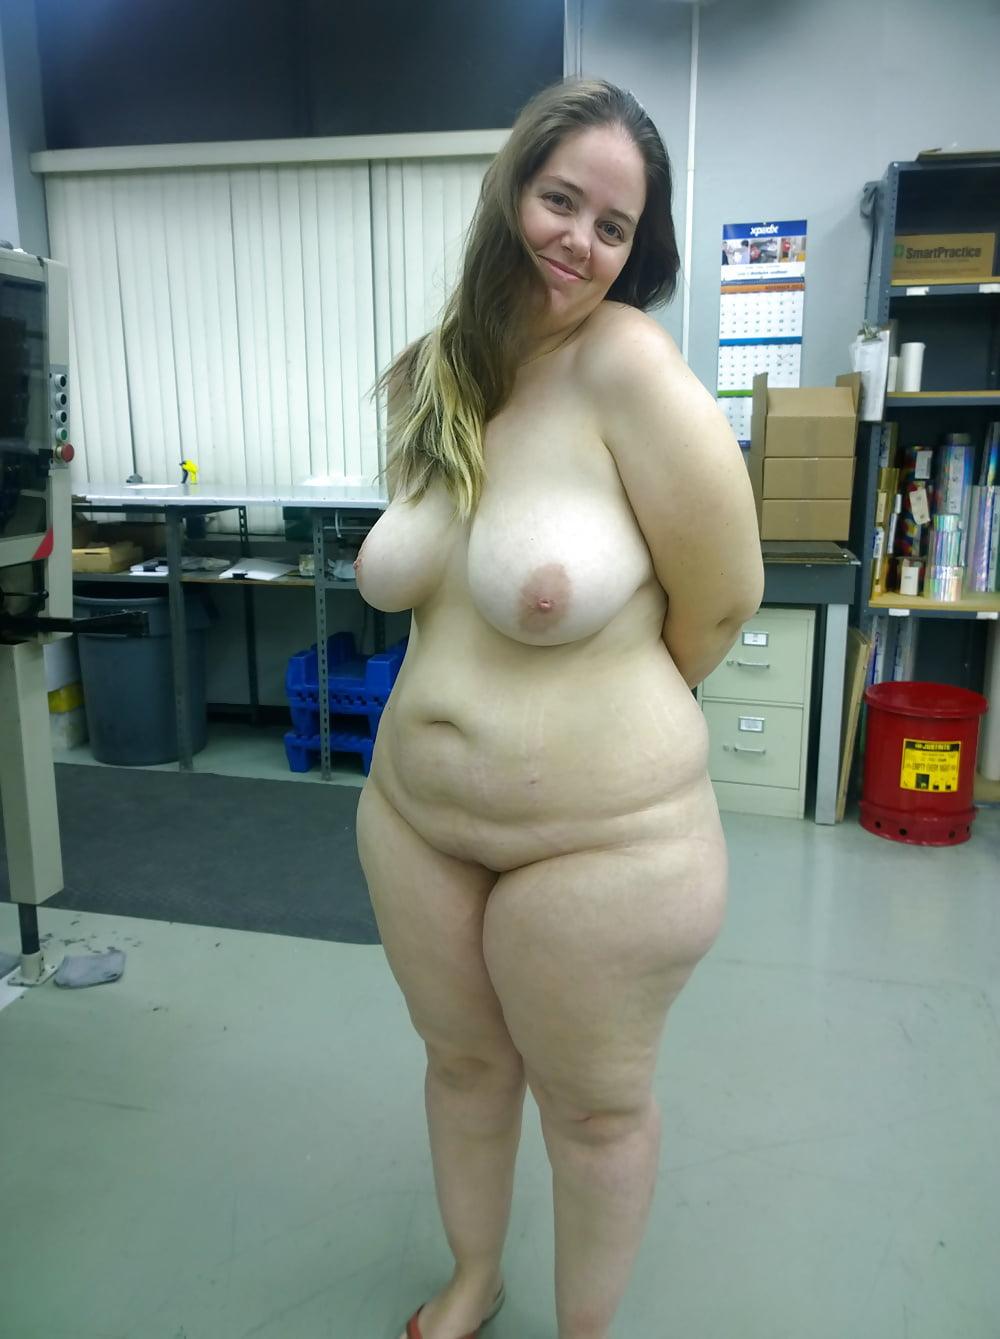 Fat nude hips of girls licking lesbians slut